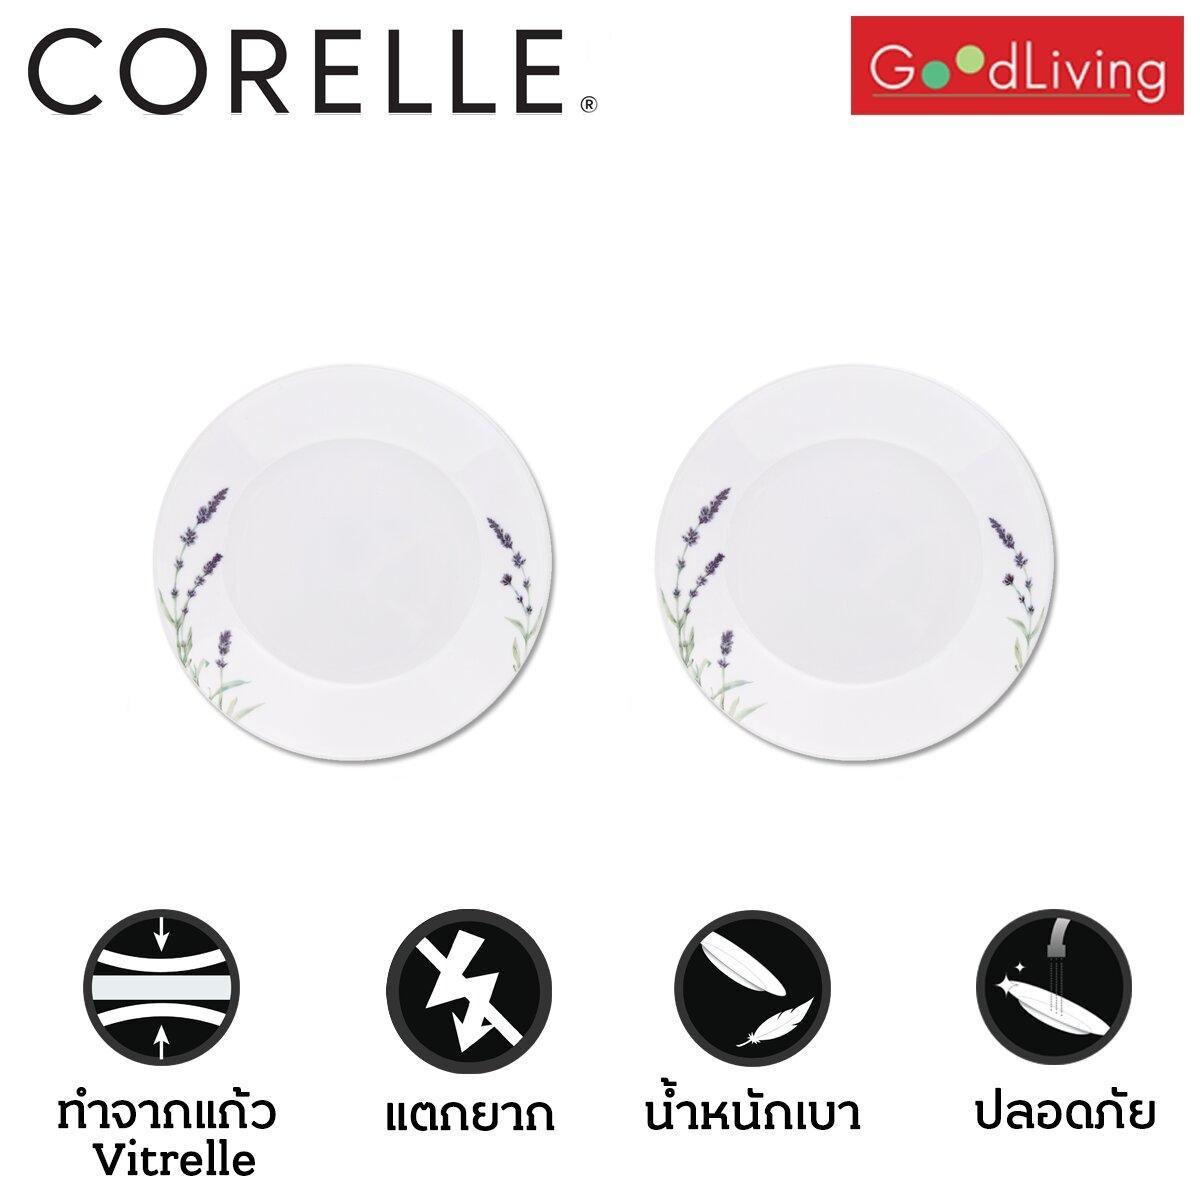 Corelle จานอาหารสีม่วง ขนาด  7 นิ้ว (18 ซม.) 2 ชิ้น/C-03-106-LG-2